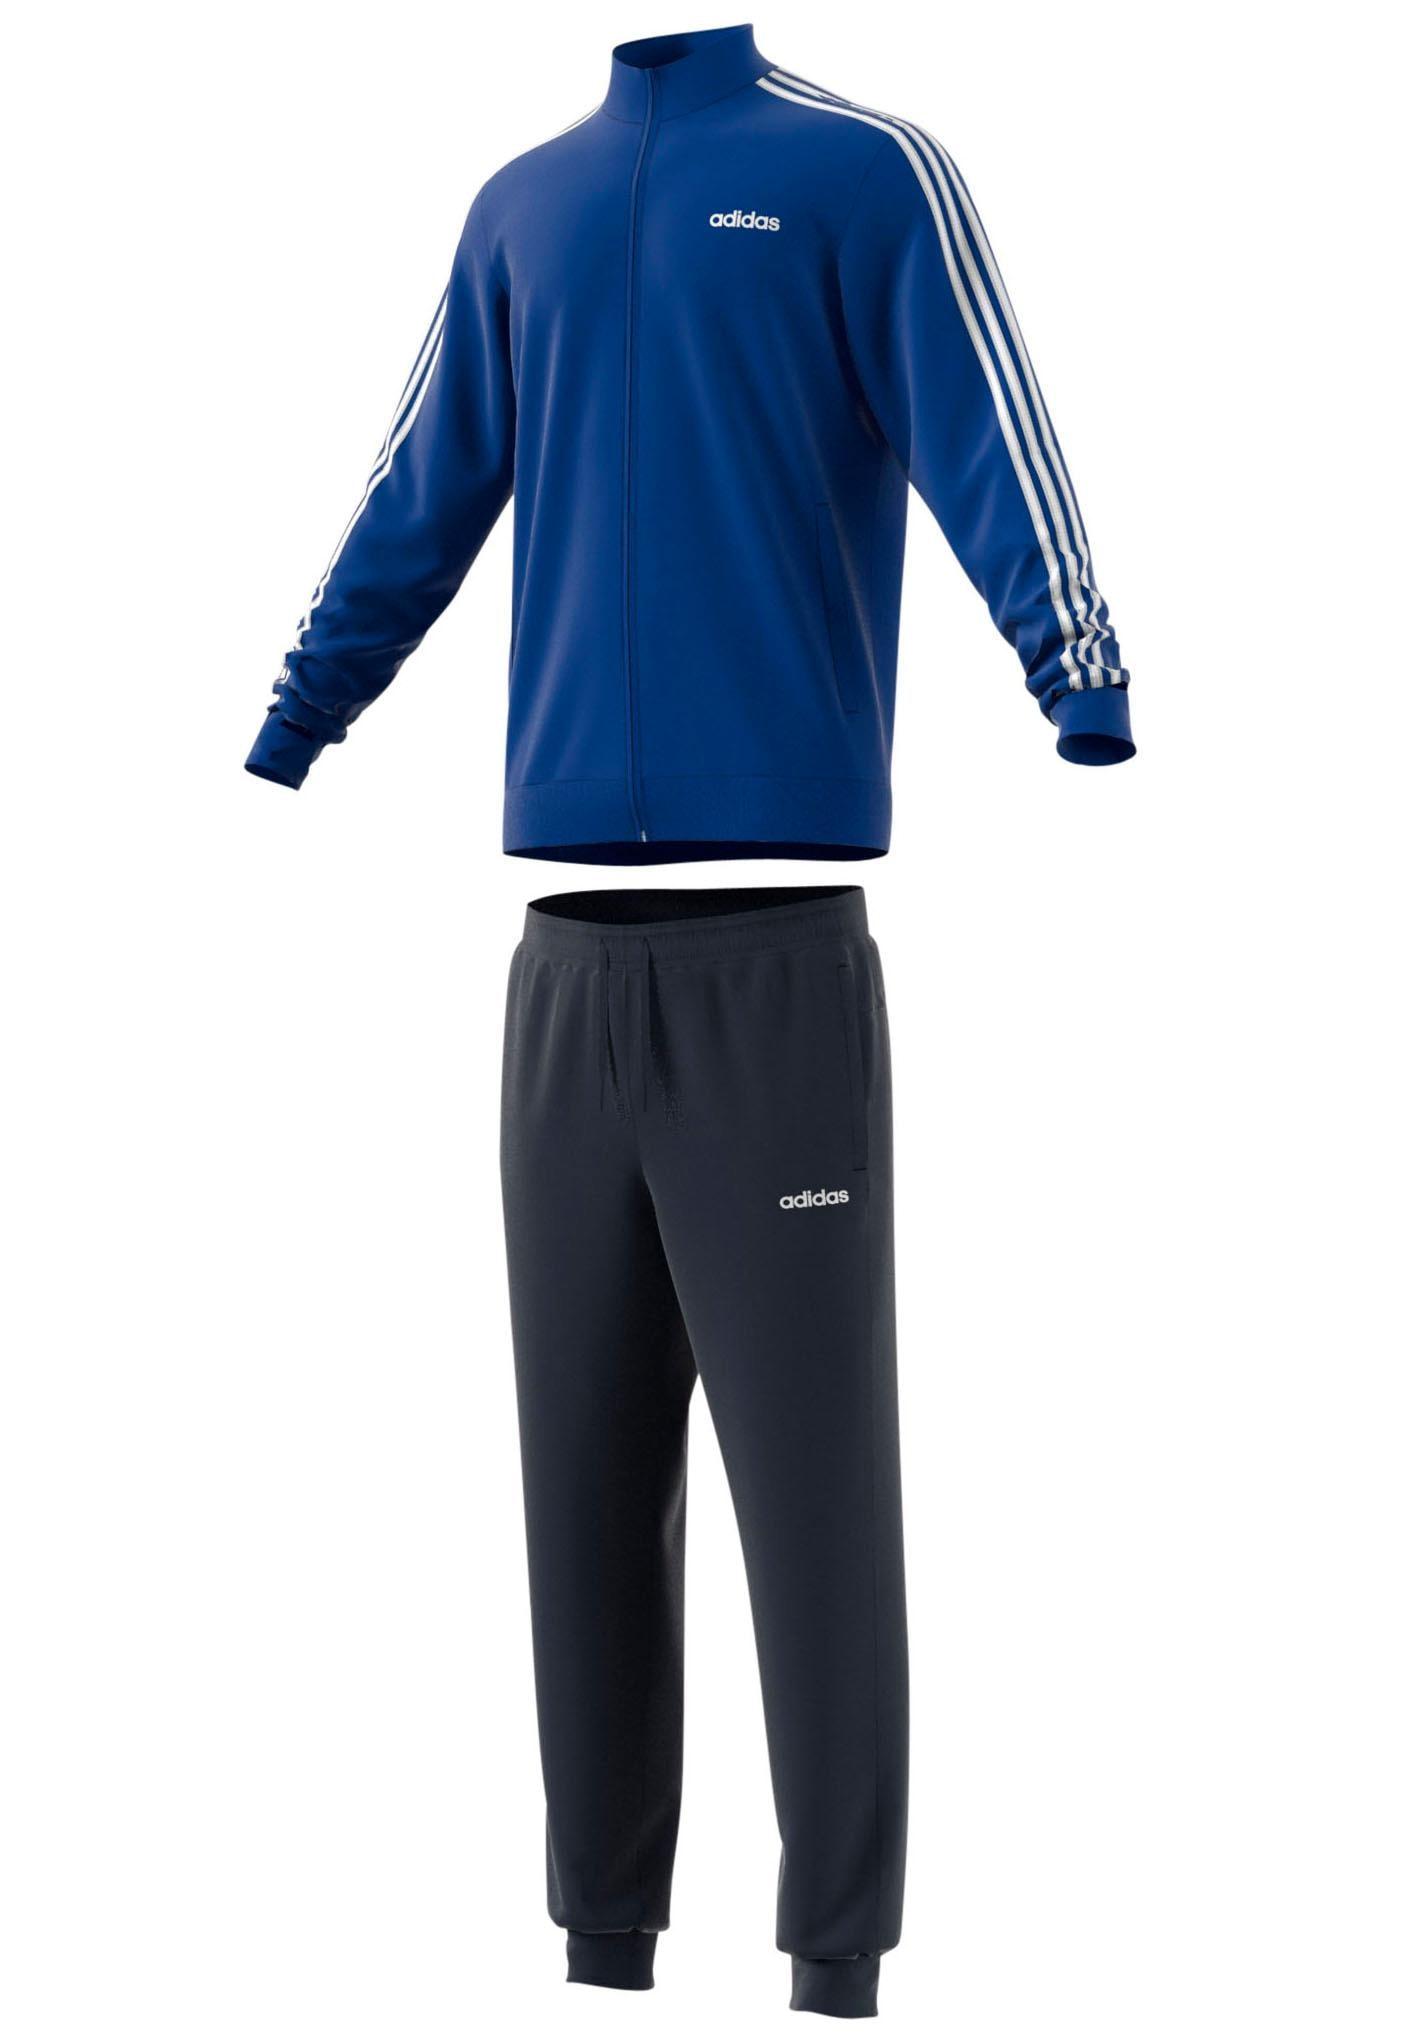 adidas Jogginganzug MEN TRACK SUIT RELAX (Set 2 tlg) | Sportbekleidung > Sportanzüge > Jogginganzüge | Adidas